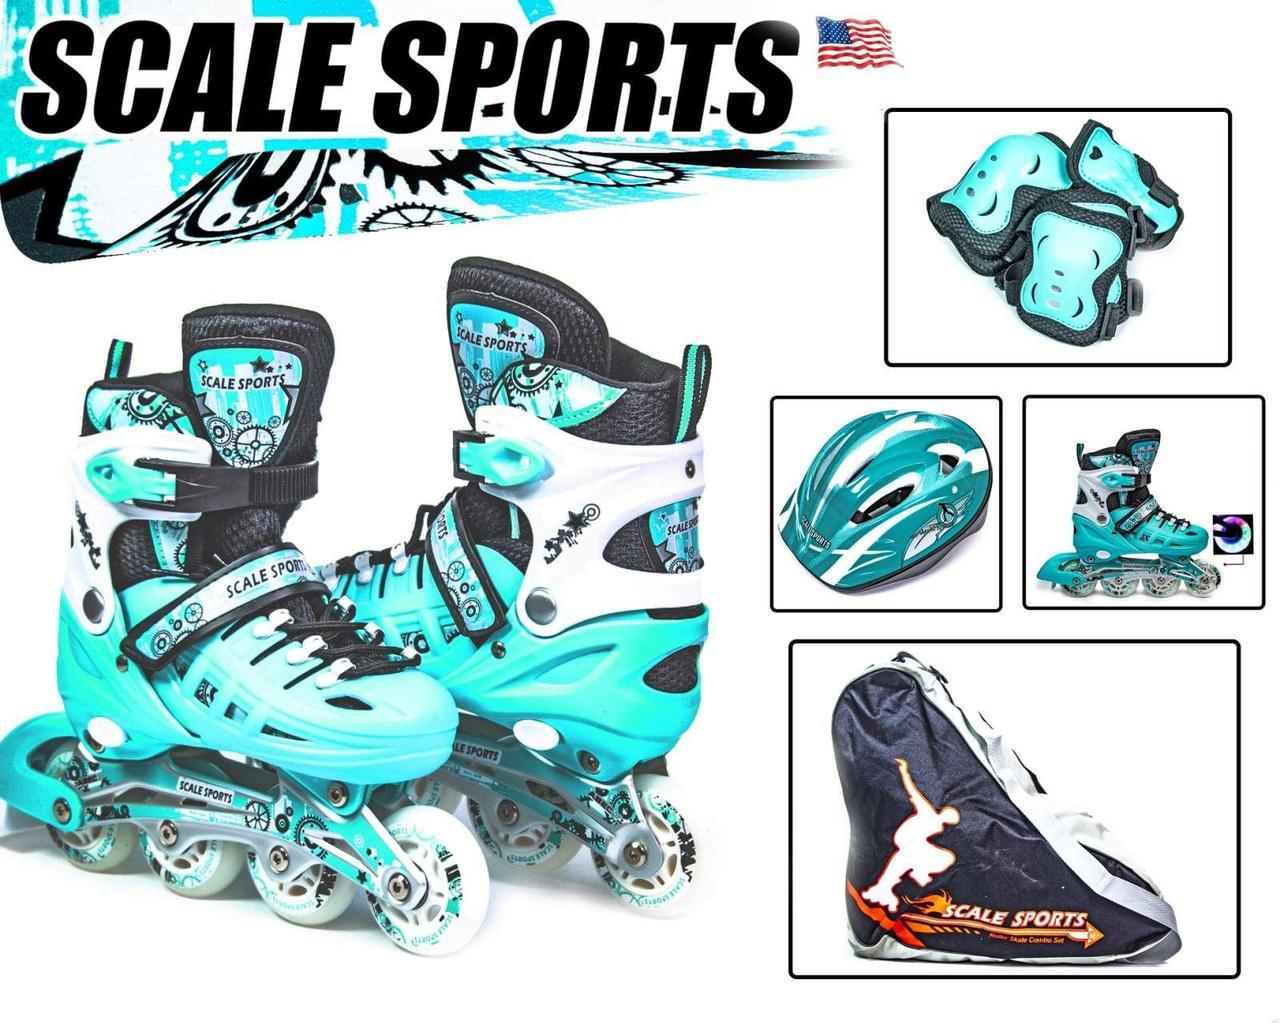 Комплект Ролики, Защита, Шлем Scale Sport. Бирюзовые, Размер 30-33